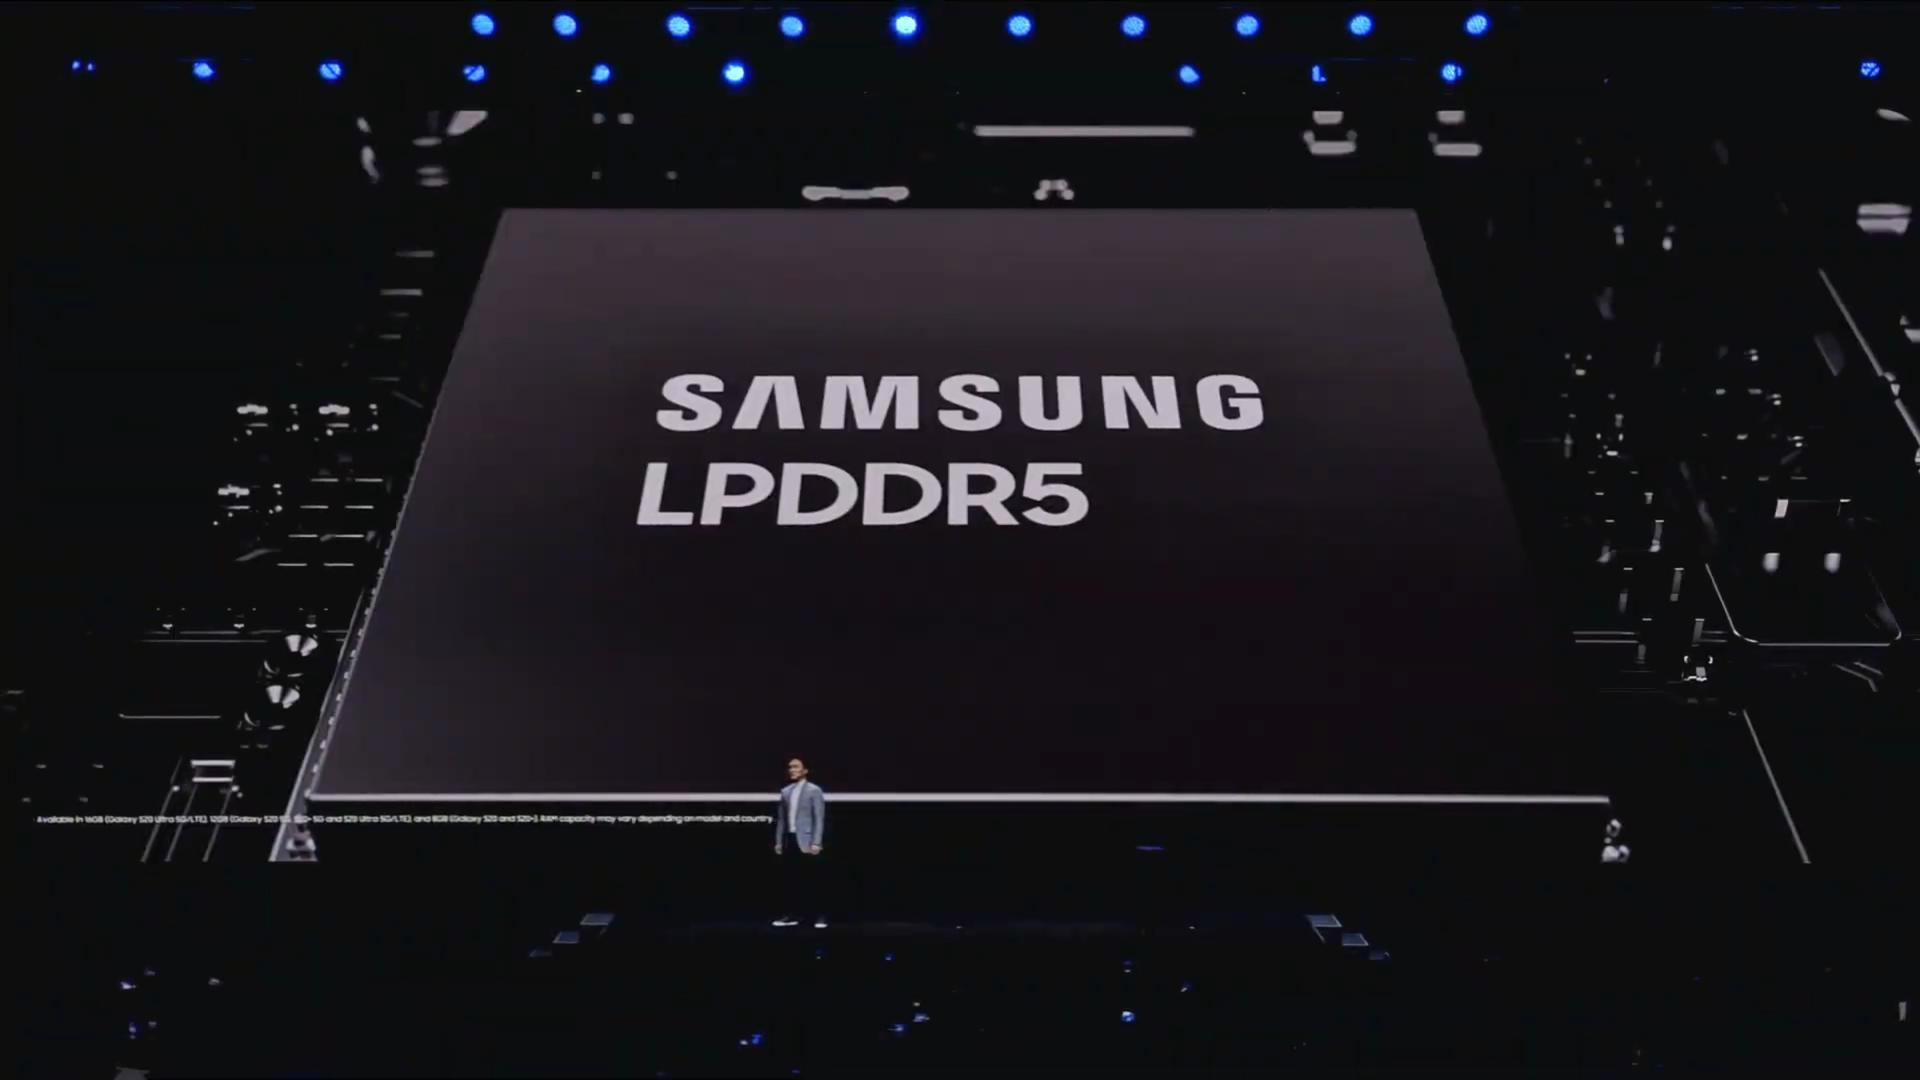 galaxy S20 LPDDR5 Samsung Unpacked 2020